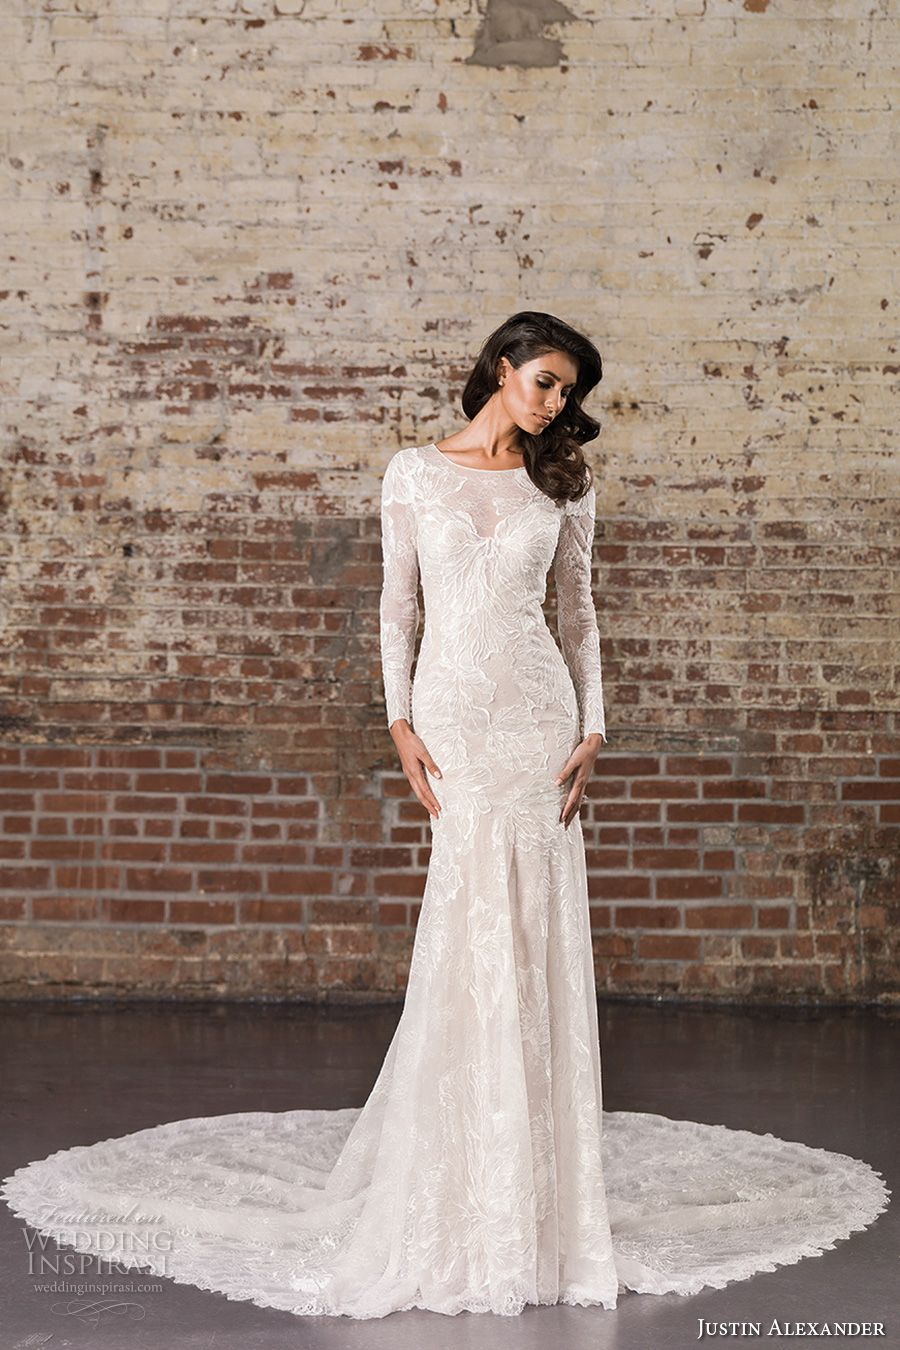 3160bbd851d1 justin alexander spring 2017 bridal long sleeves jewel neckline full  embellishment elegant lace fit and flare wedding dress illusion back royal  train (9856) ...